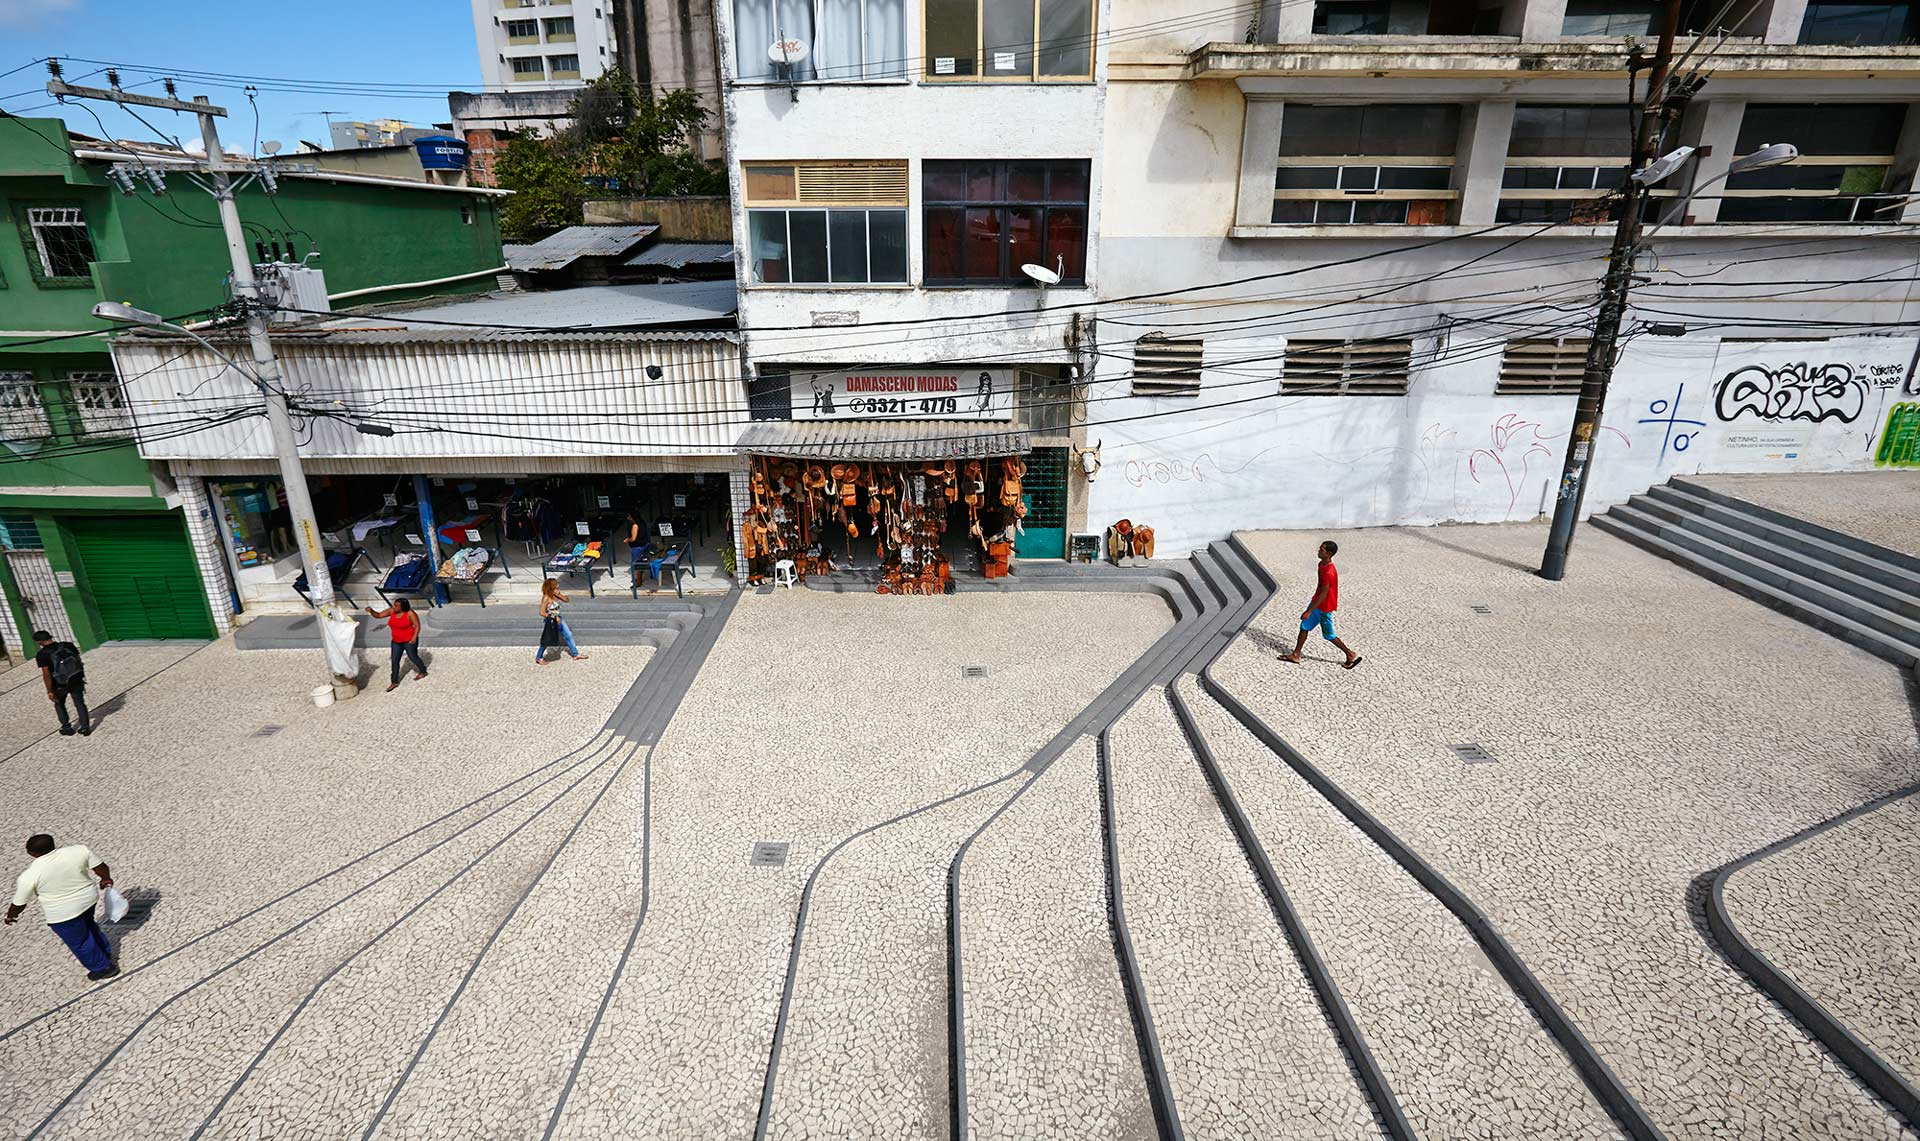 Ladeira Da Barroquinha Urban Staircase Brazil Metro Arquitectos 02 Landscape Architecture Works